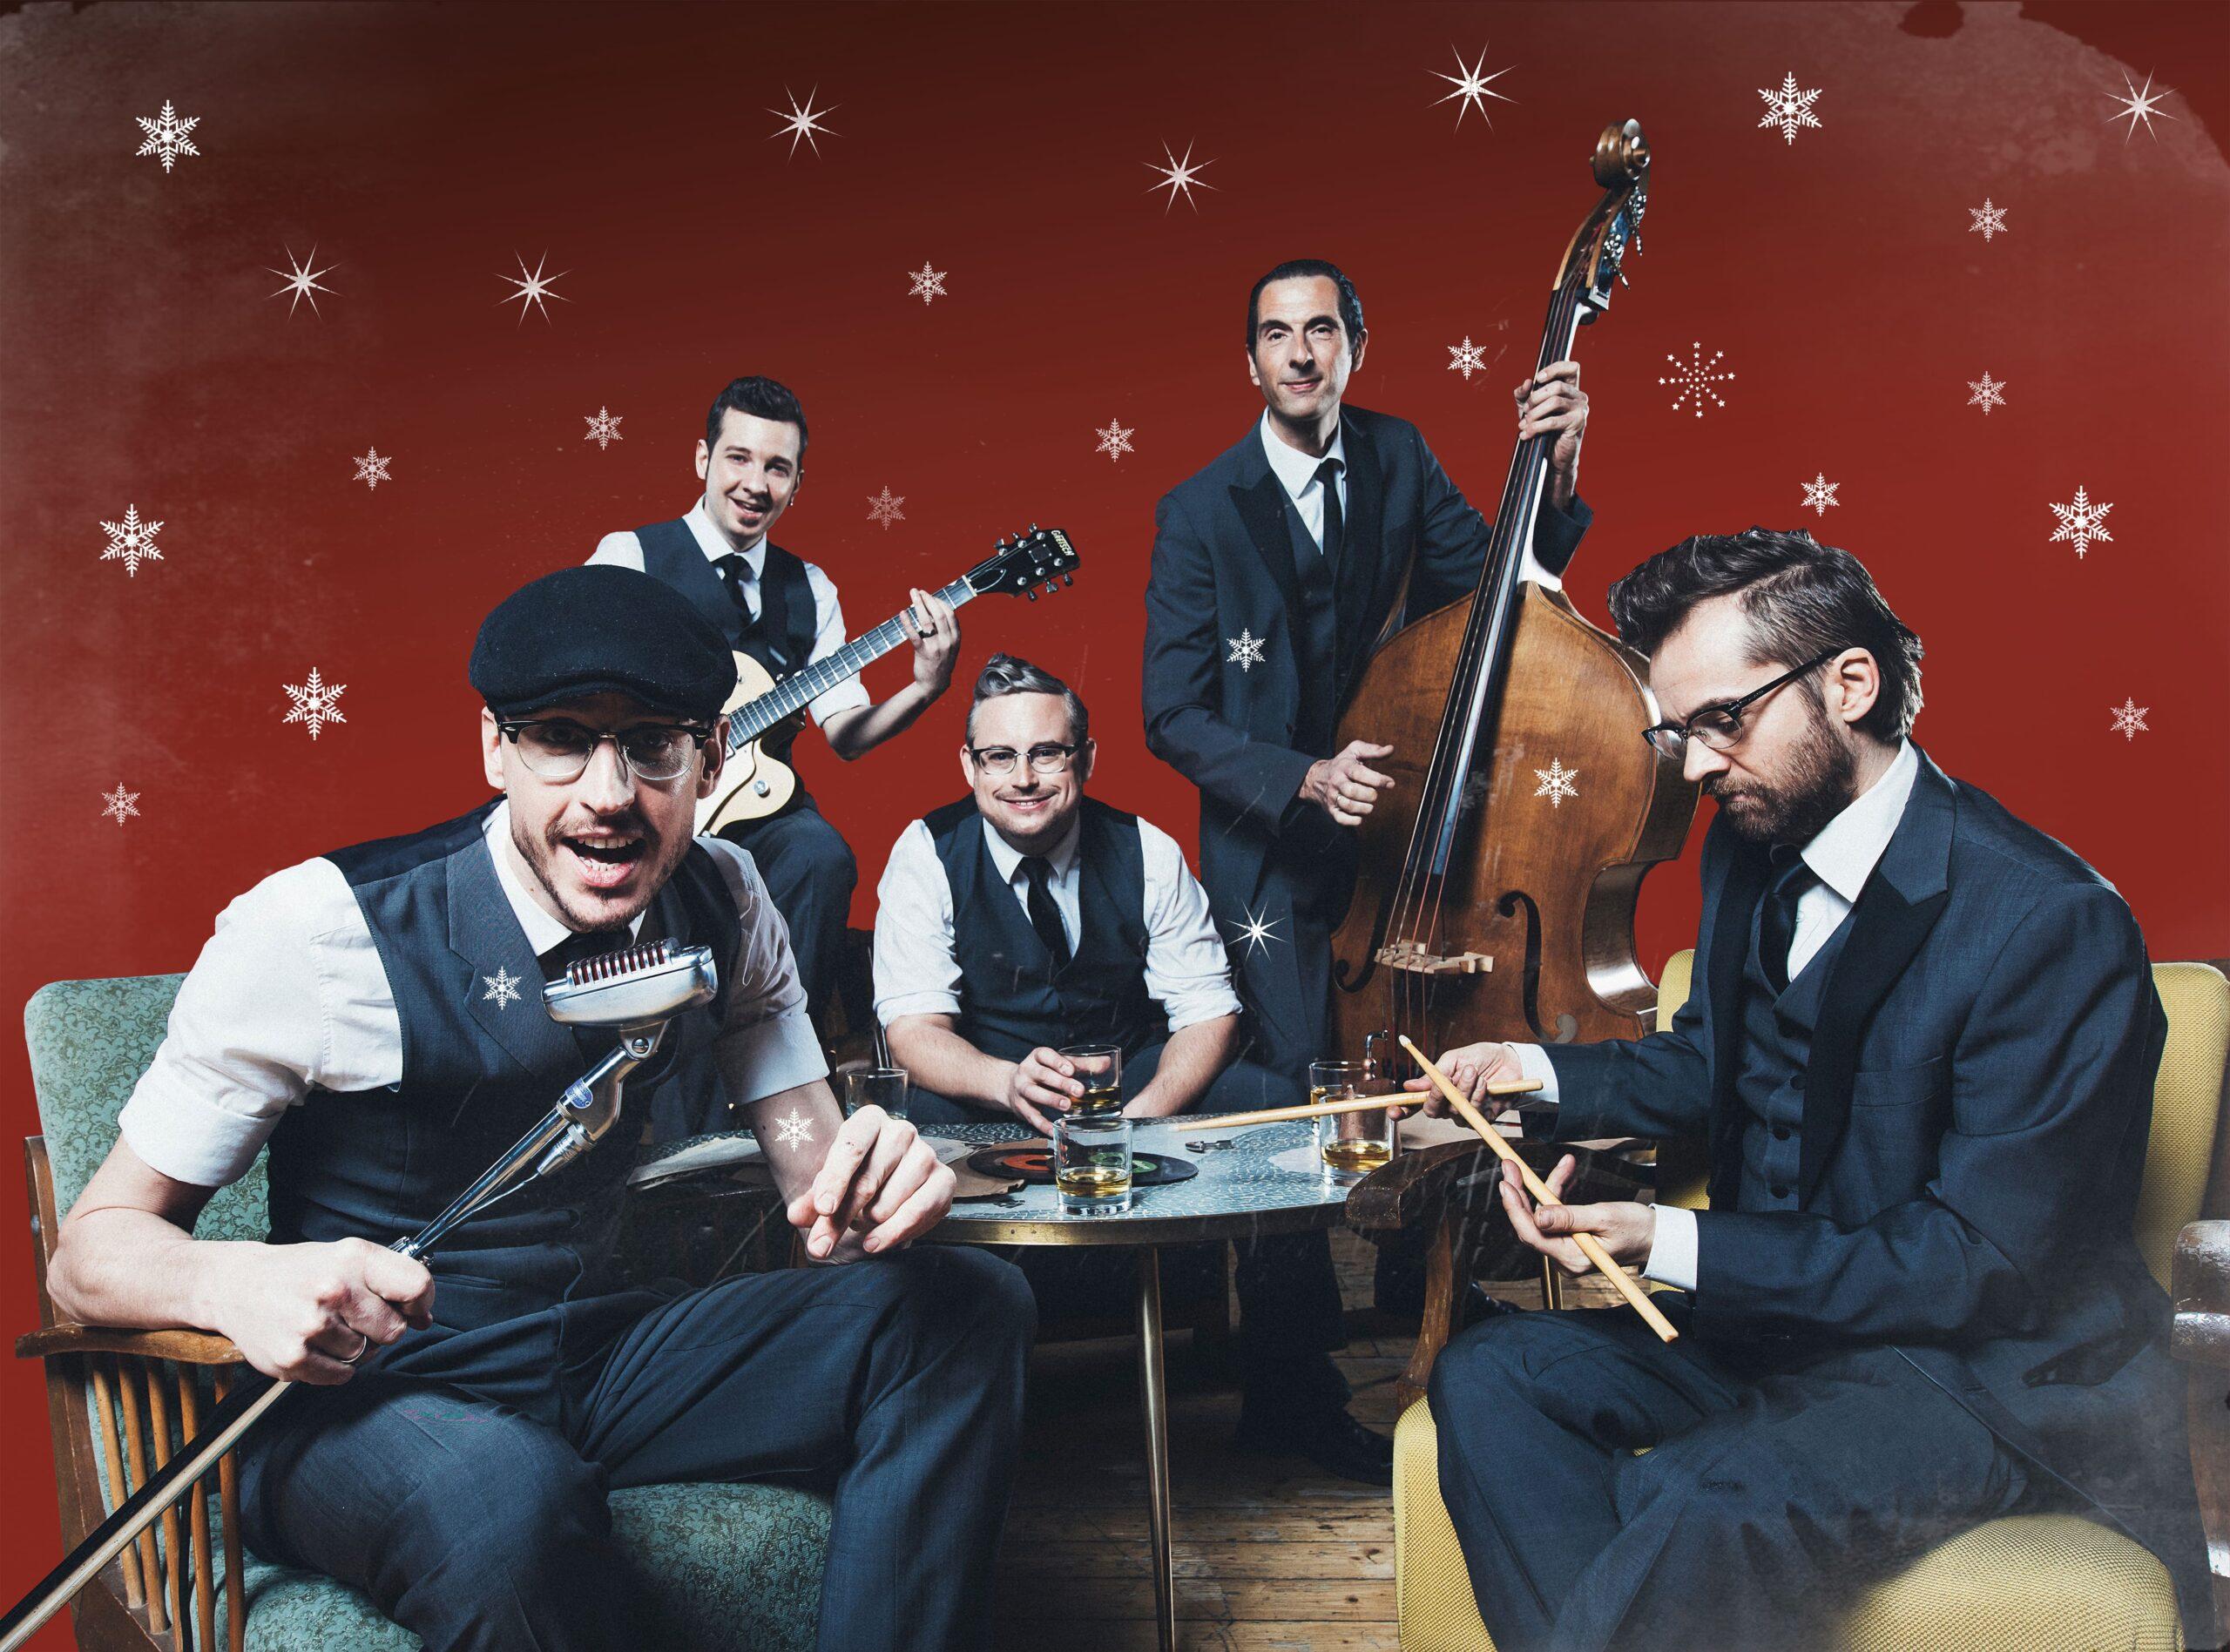 Finest 50s Christmas Musik 2021 – OldSchoolBasterds